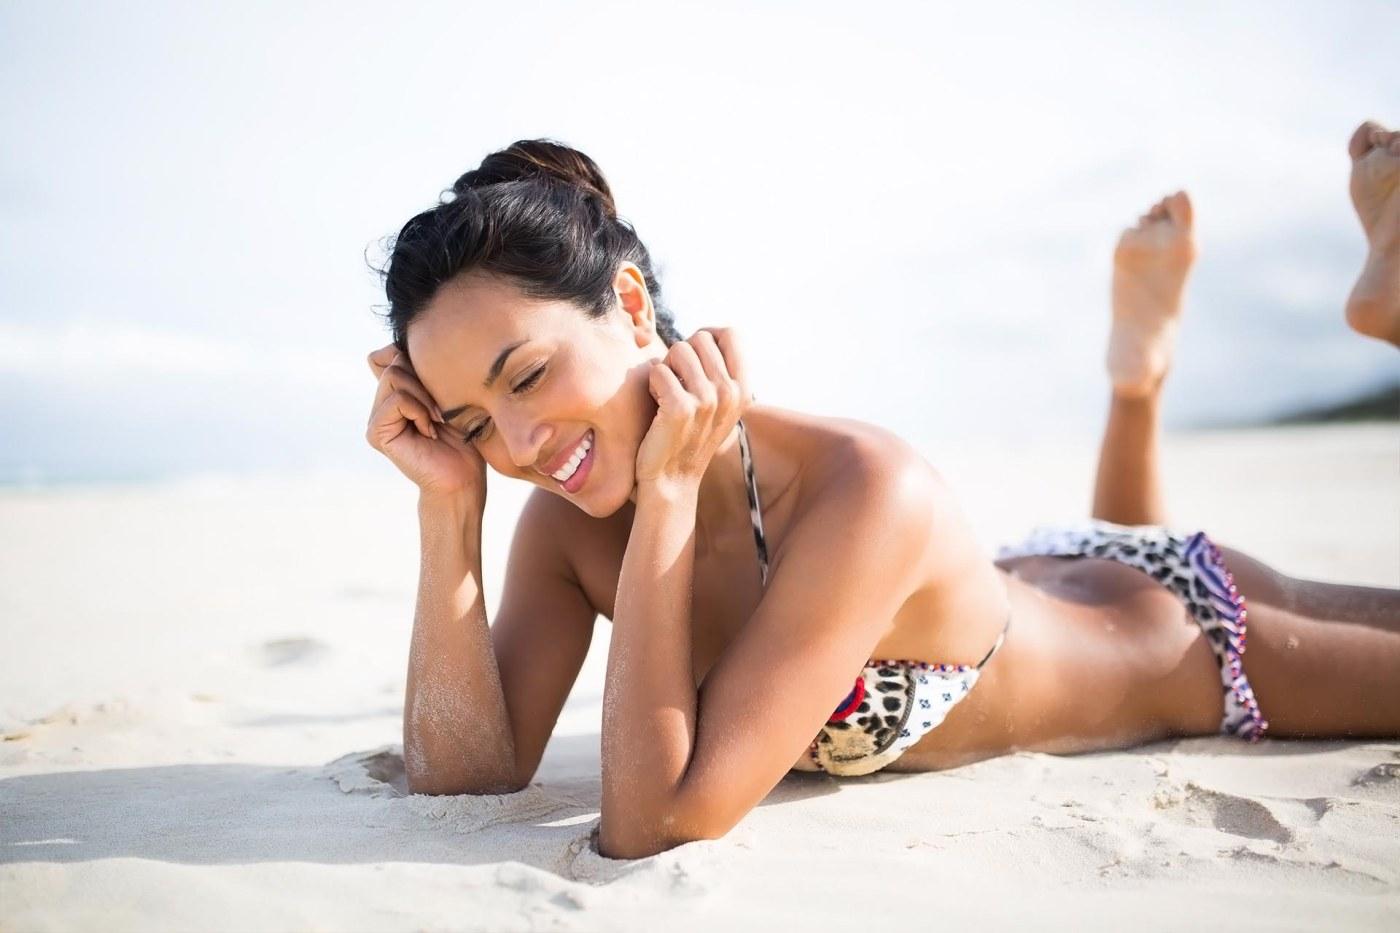 Bianca cheah, sporteluxe, IMG model